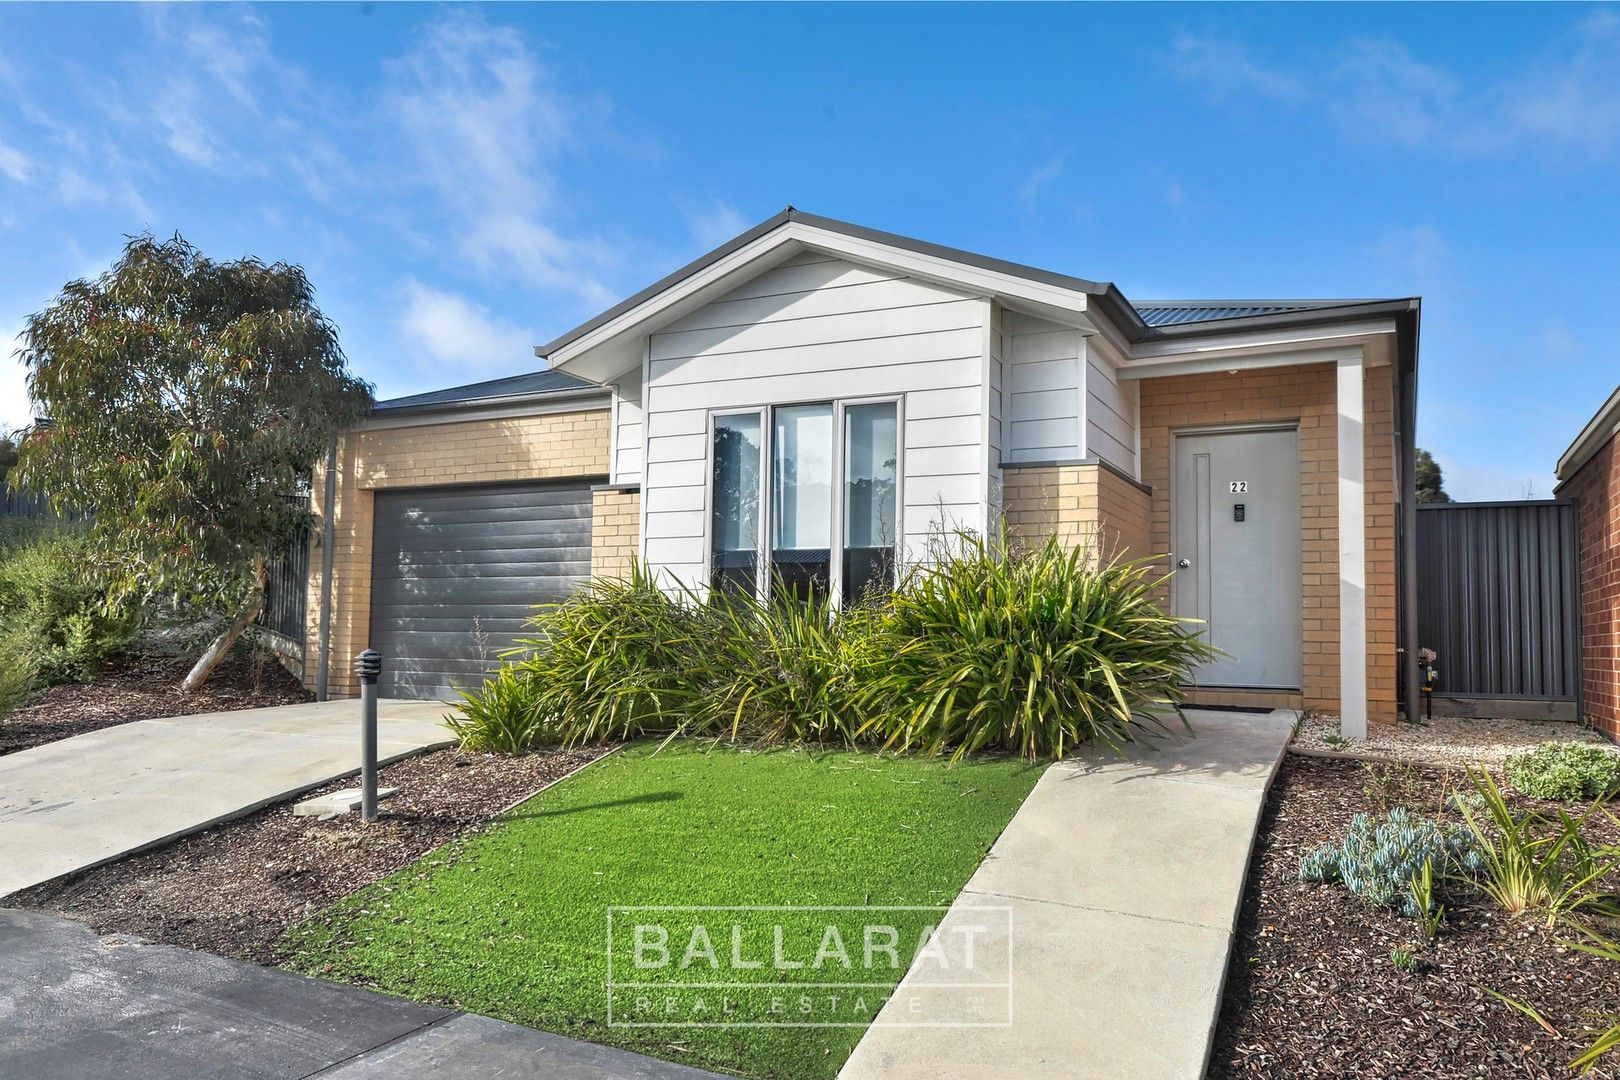 22 Millicent Place, Ballarat East VIC 3350, Image 0